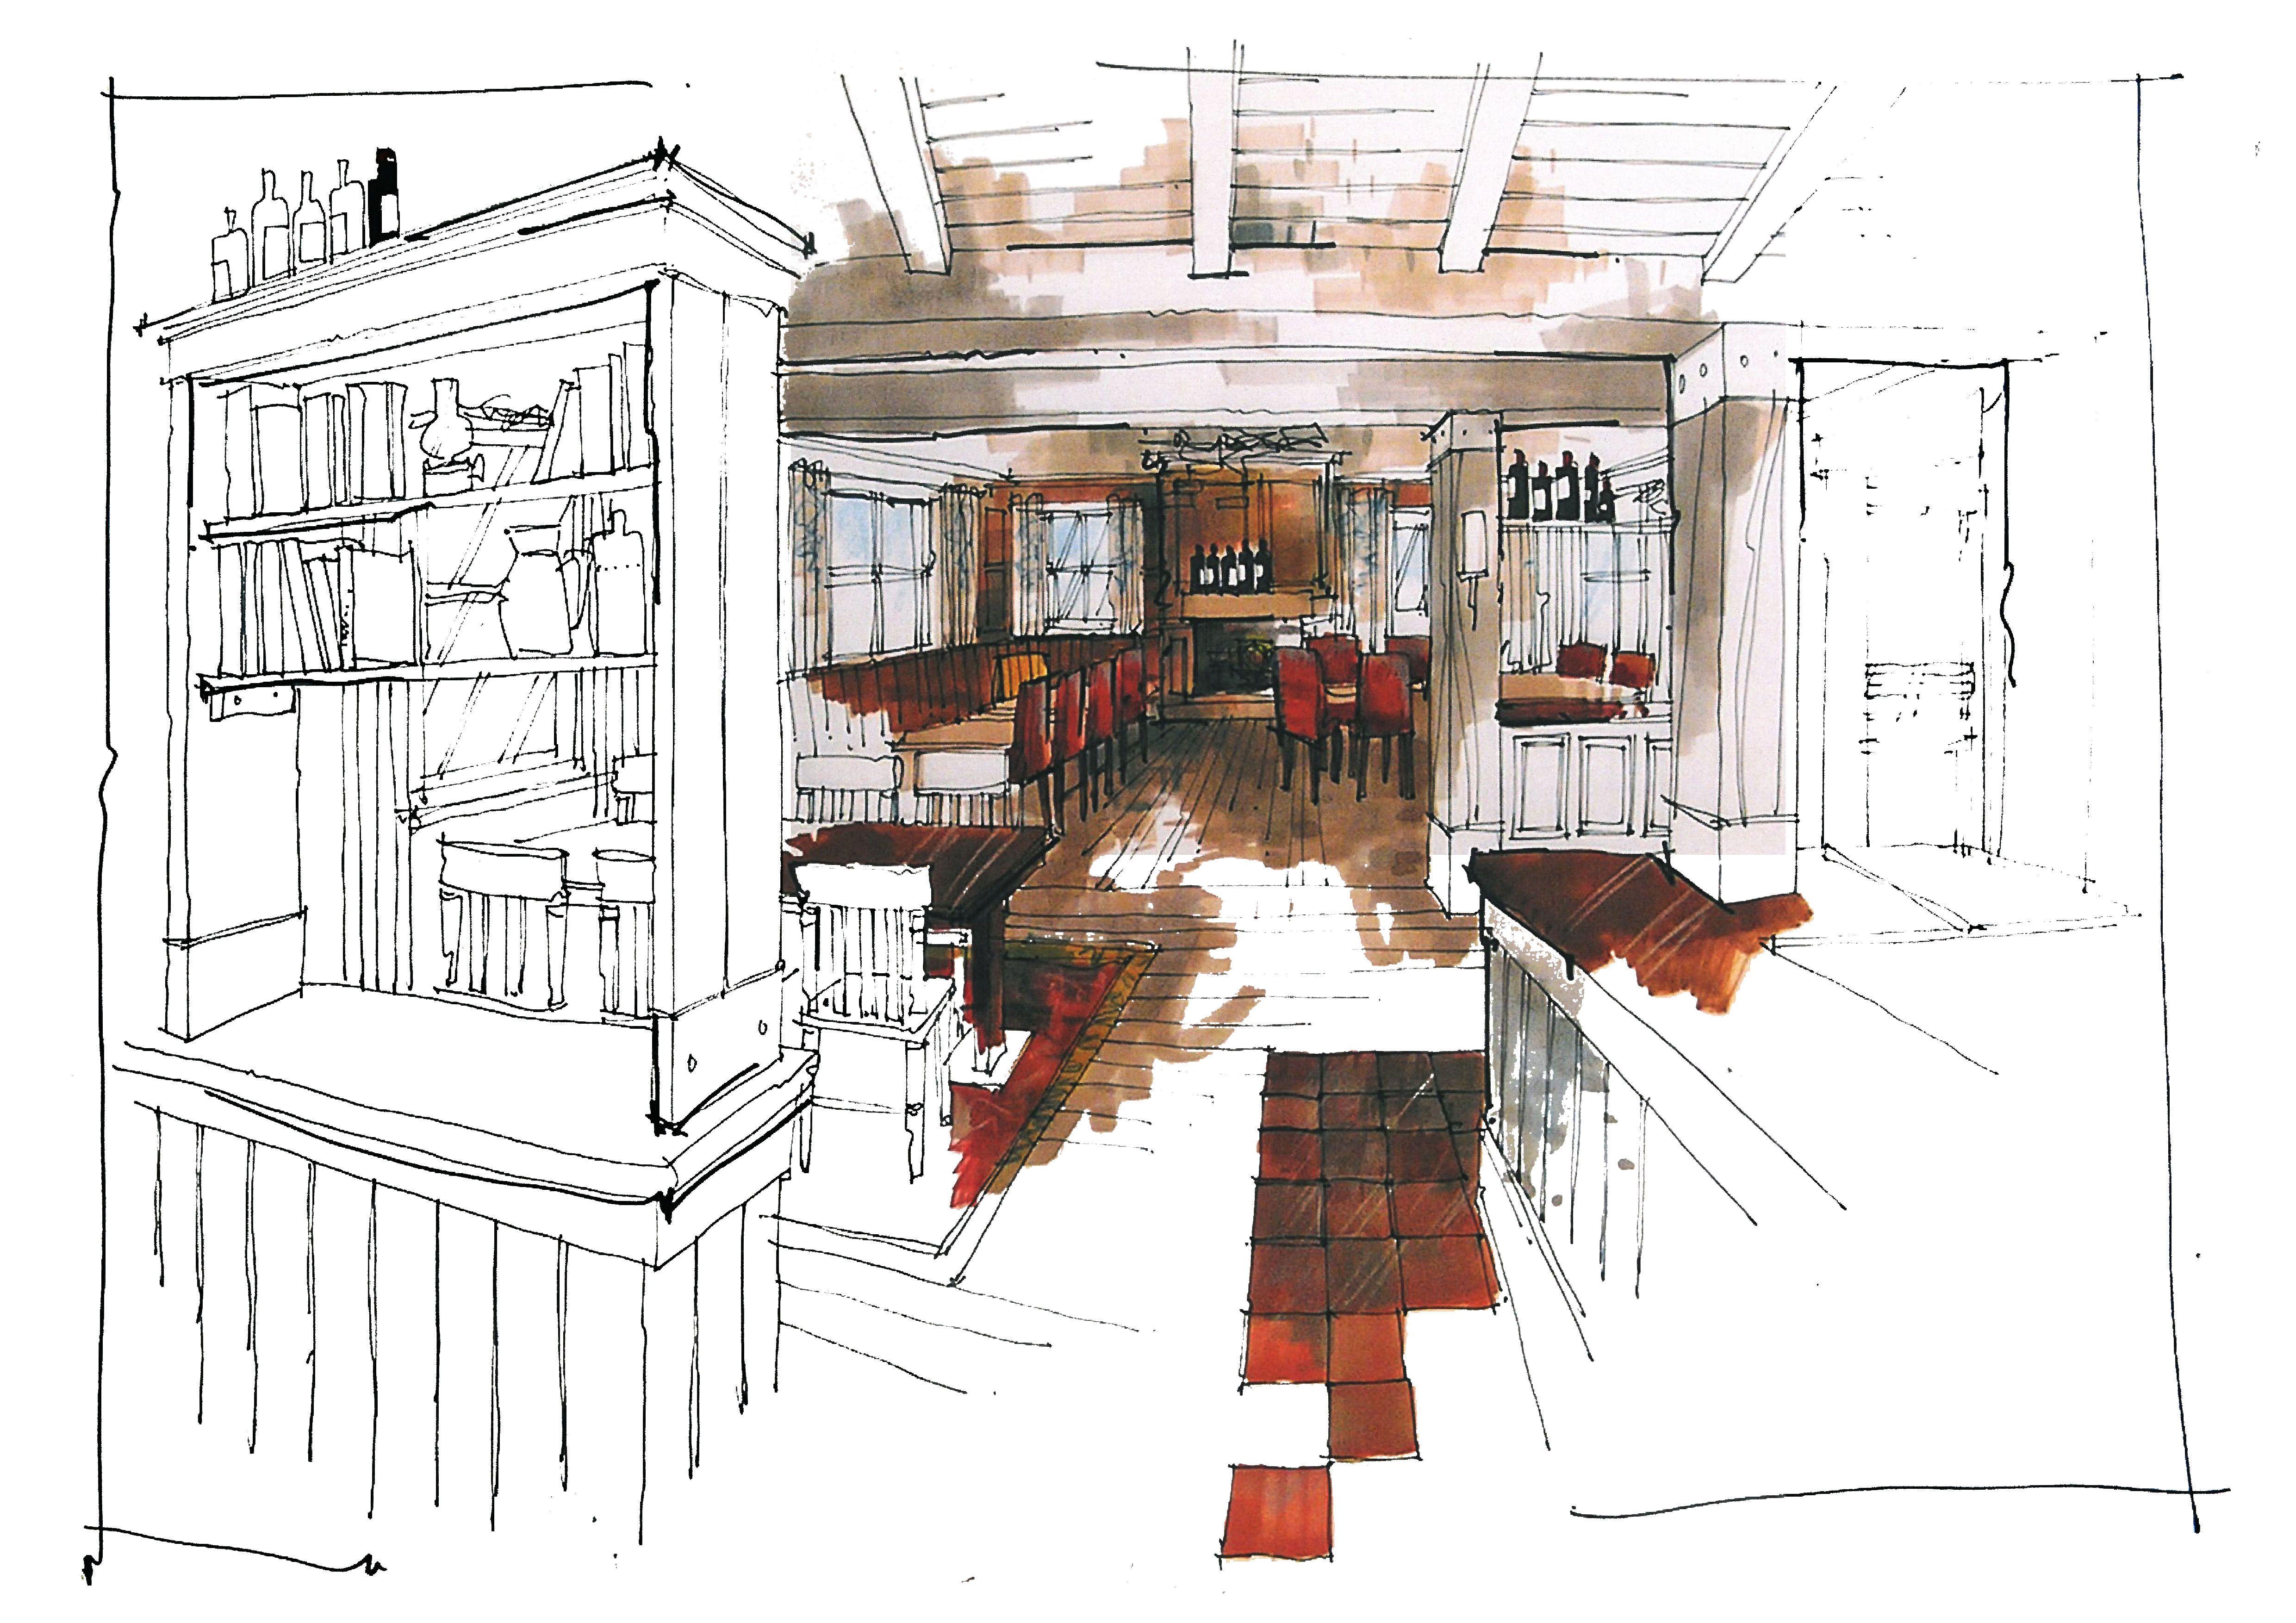 pin by gurkut uysal on architecture interior interior design rh pinterest com